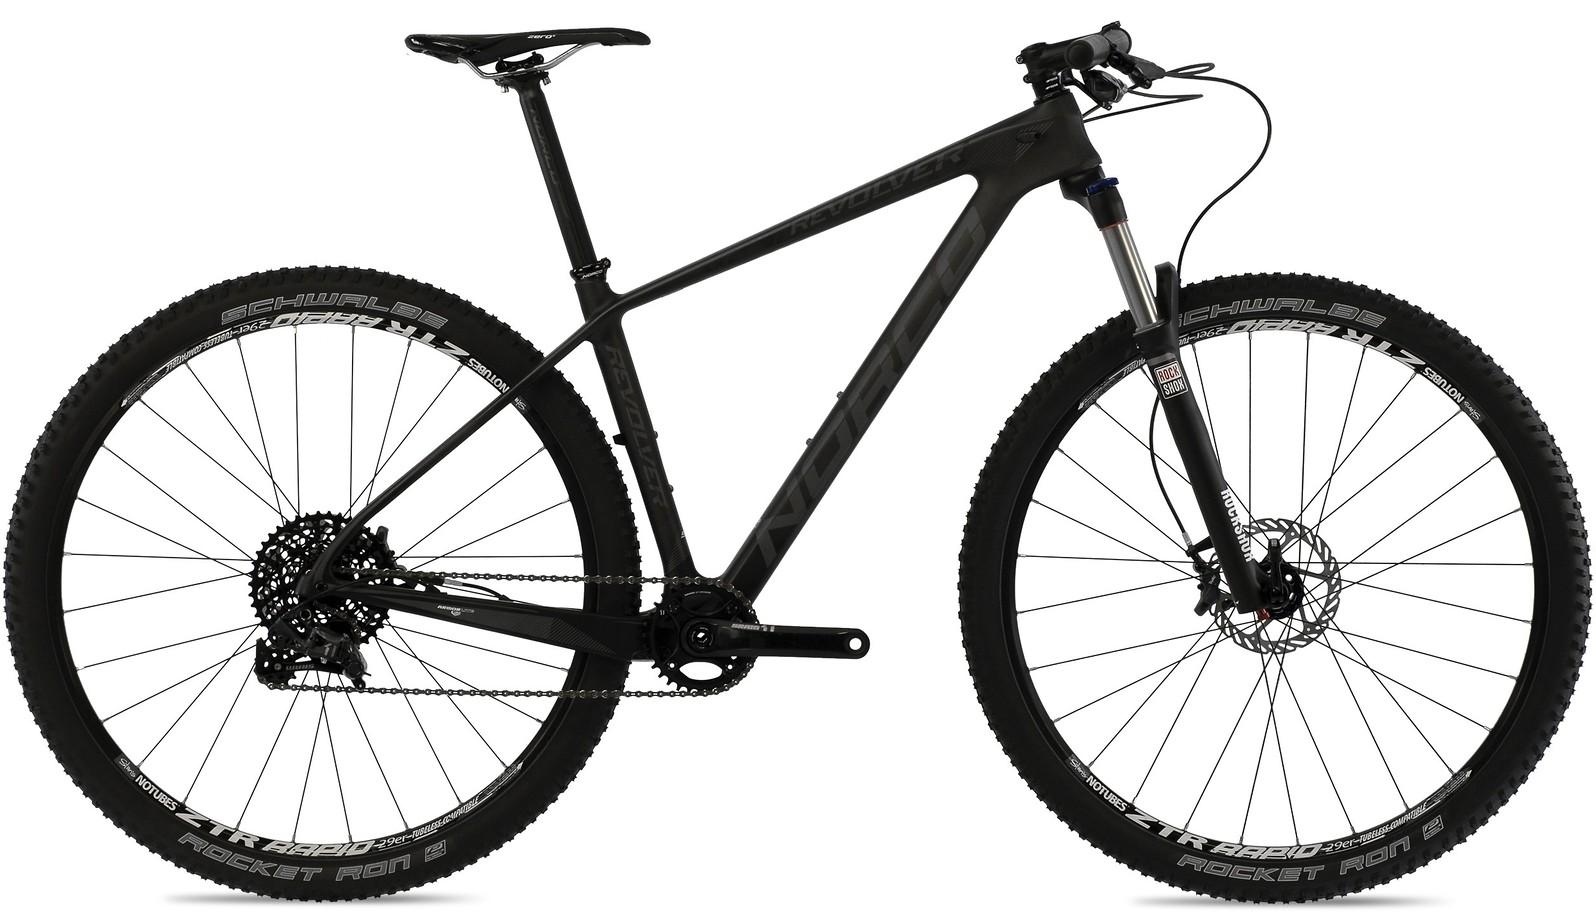 bike - 2014 Norco Revolver 9.1 HT